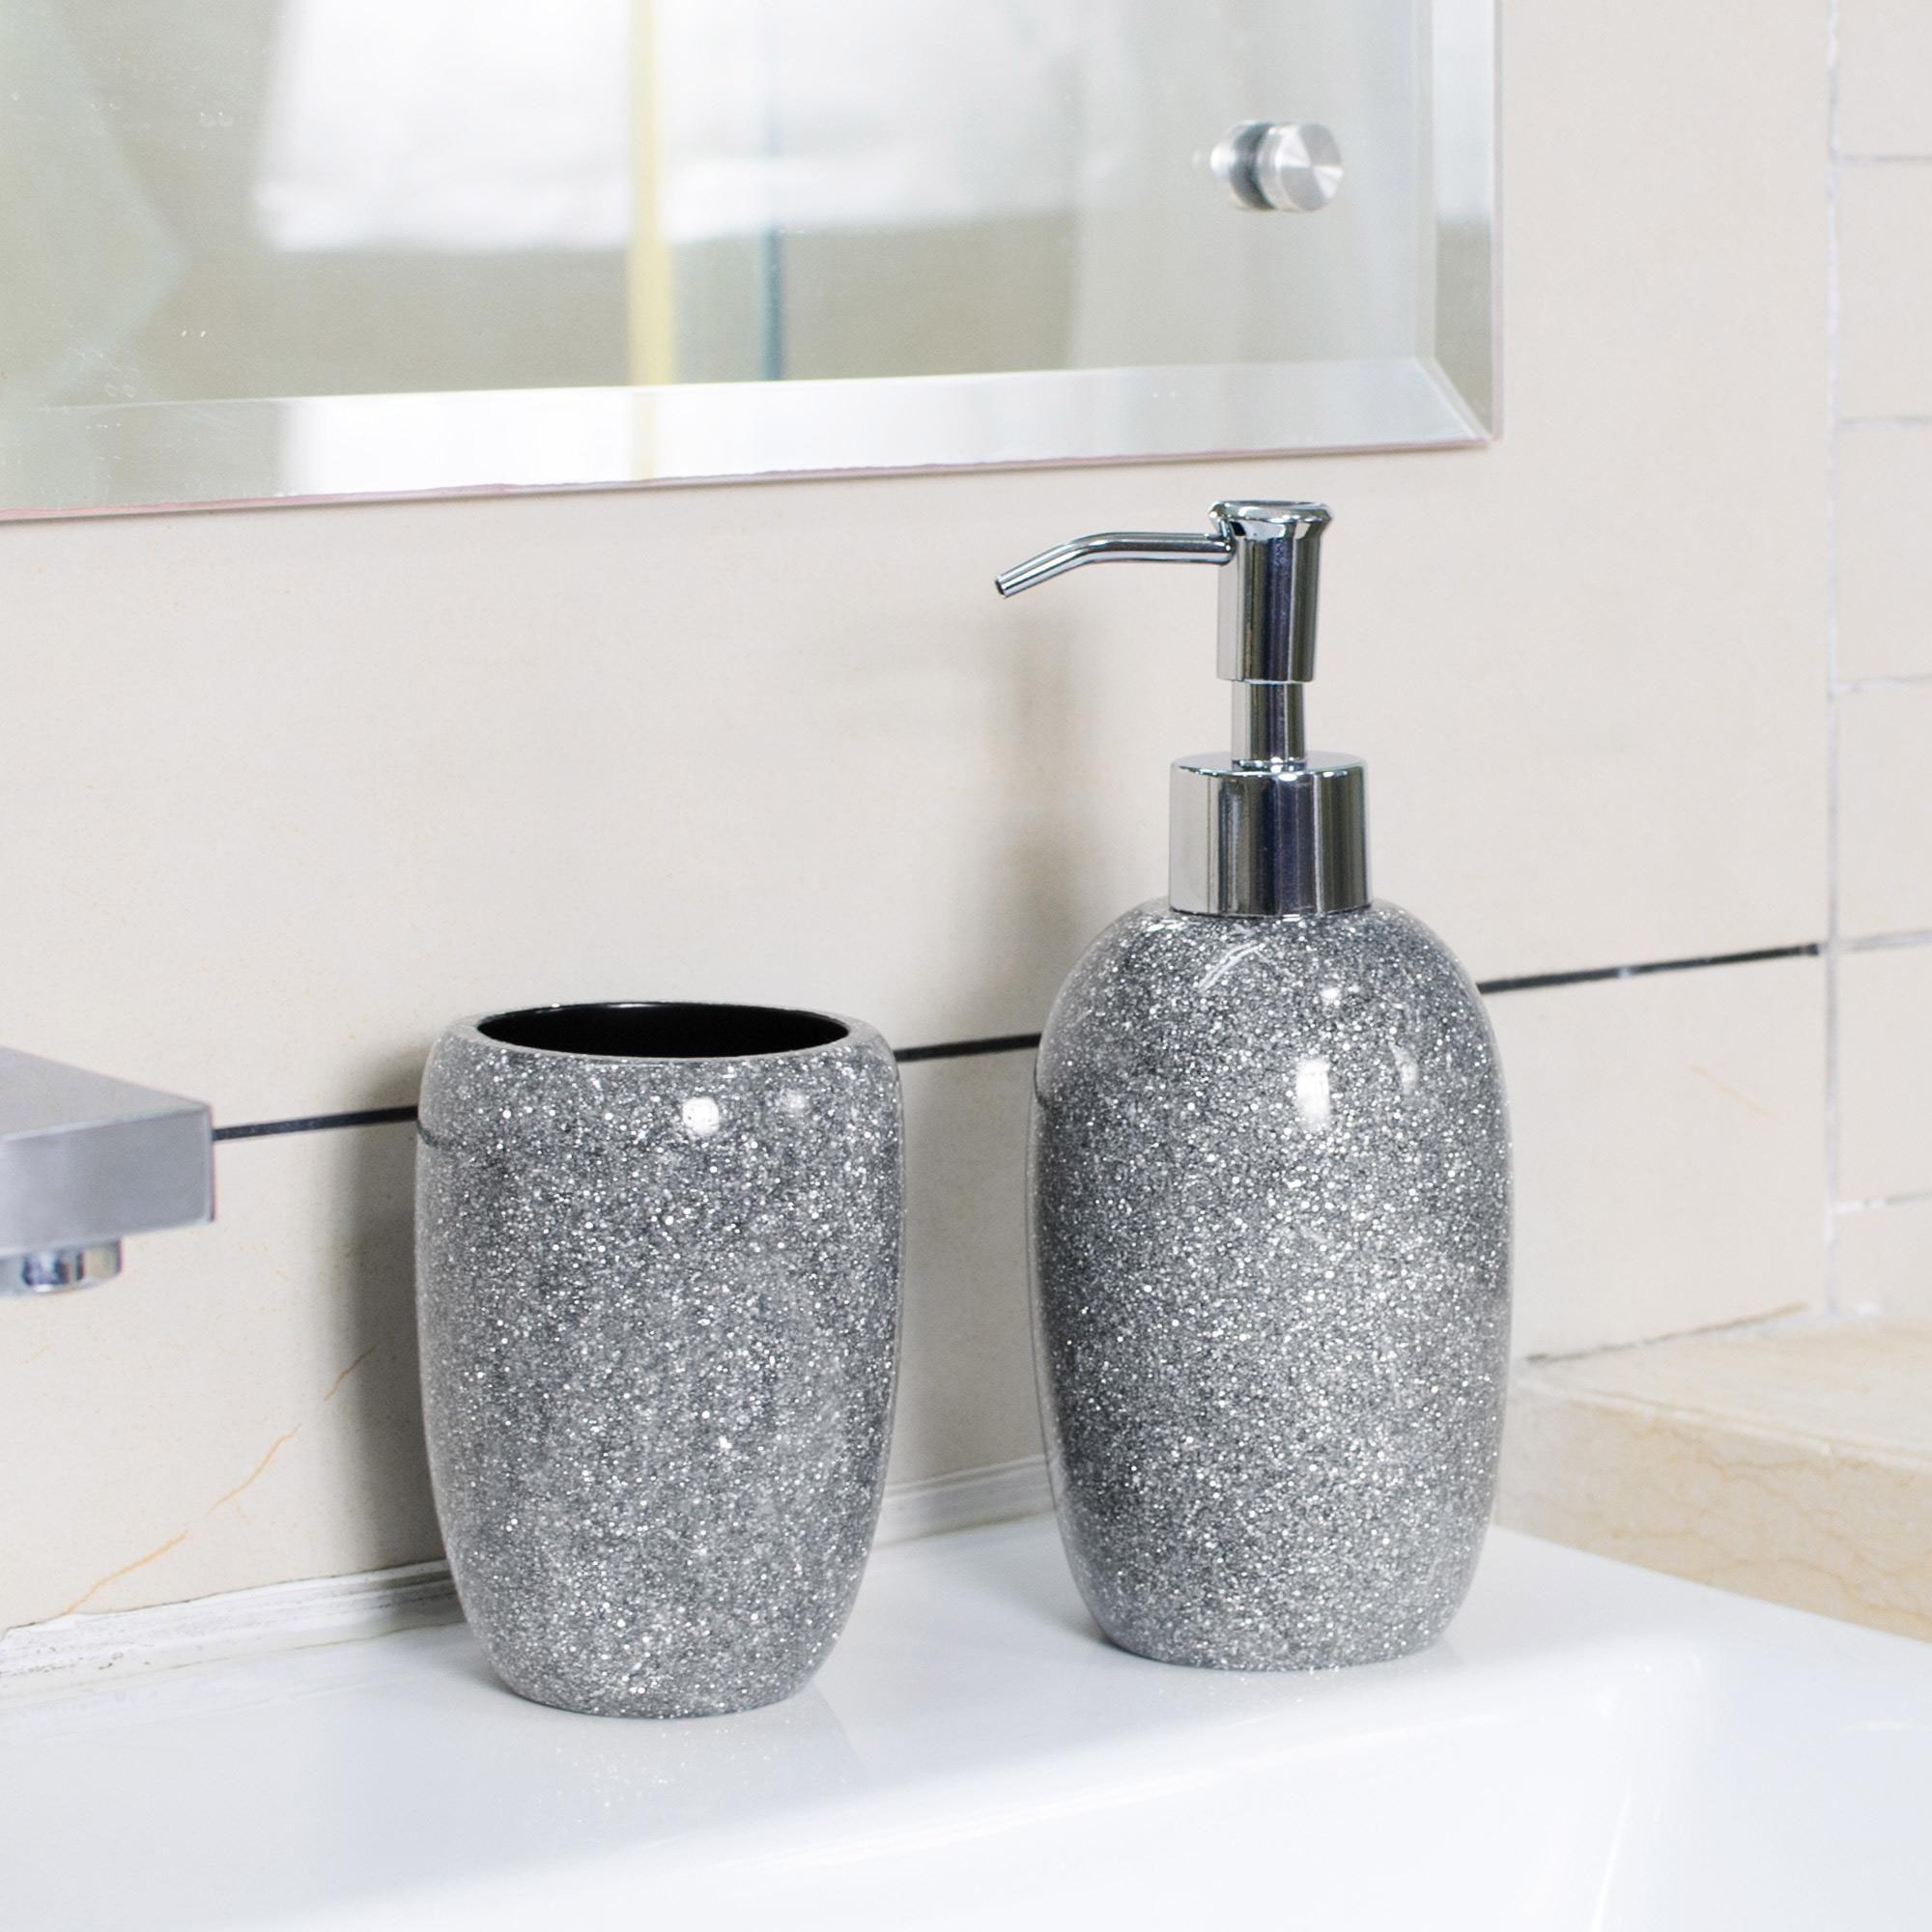 Sparkle Silver Resin Lotion Dispenser In 2020 Bathroom Sets Patterned Blinds Lotion